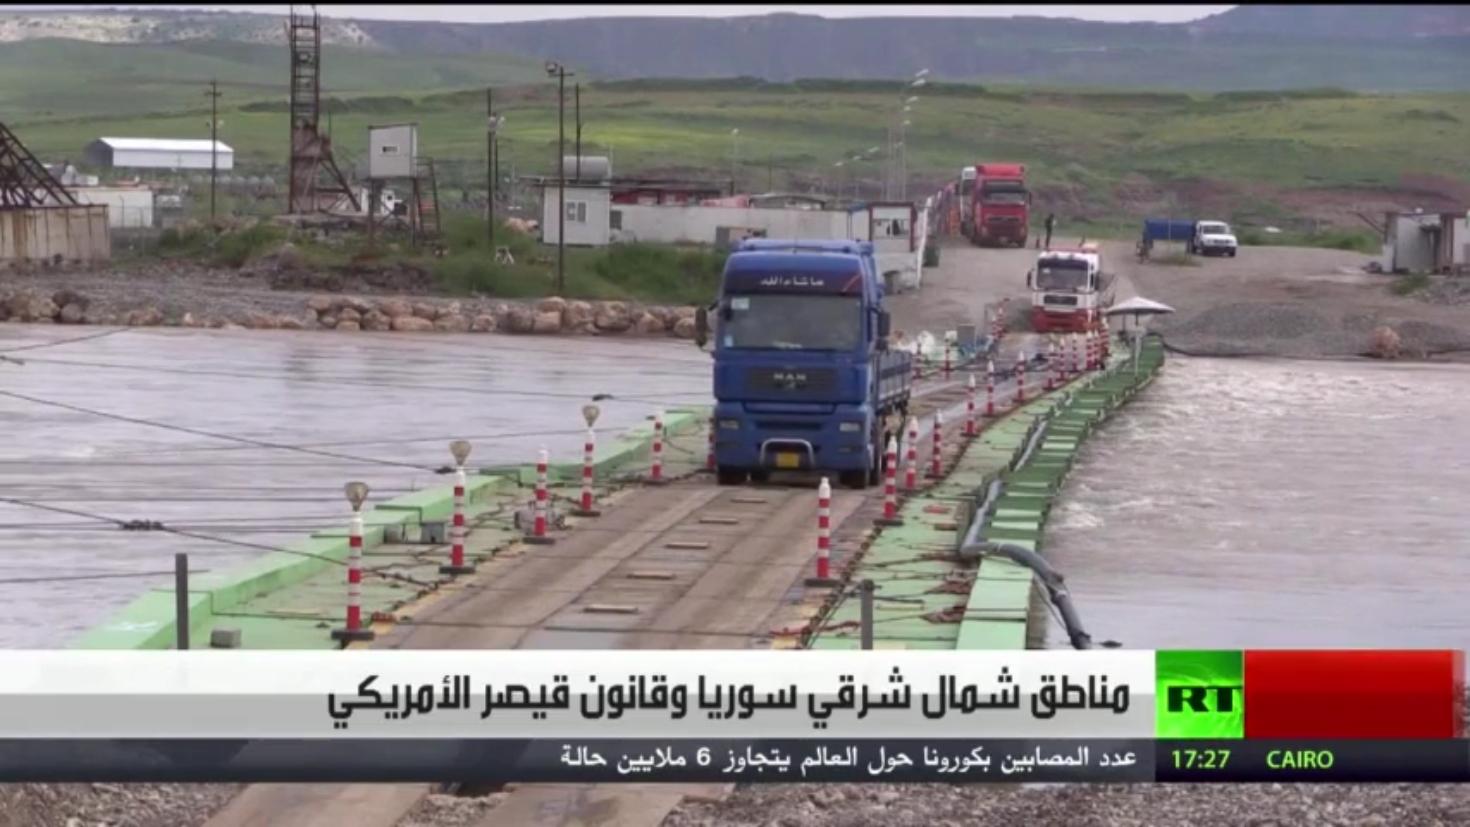 مناطق شمال شرق سوريا وقانون قيصر